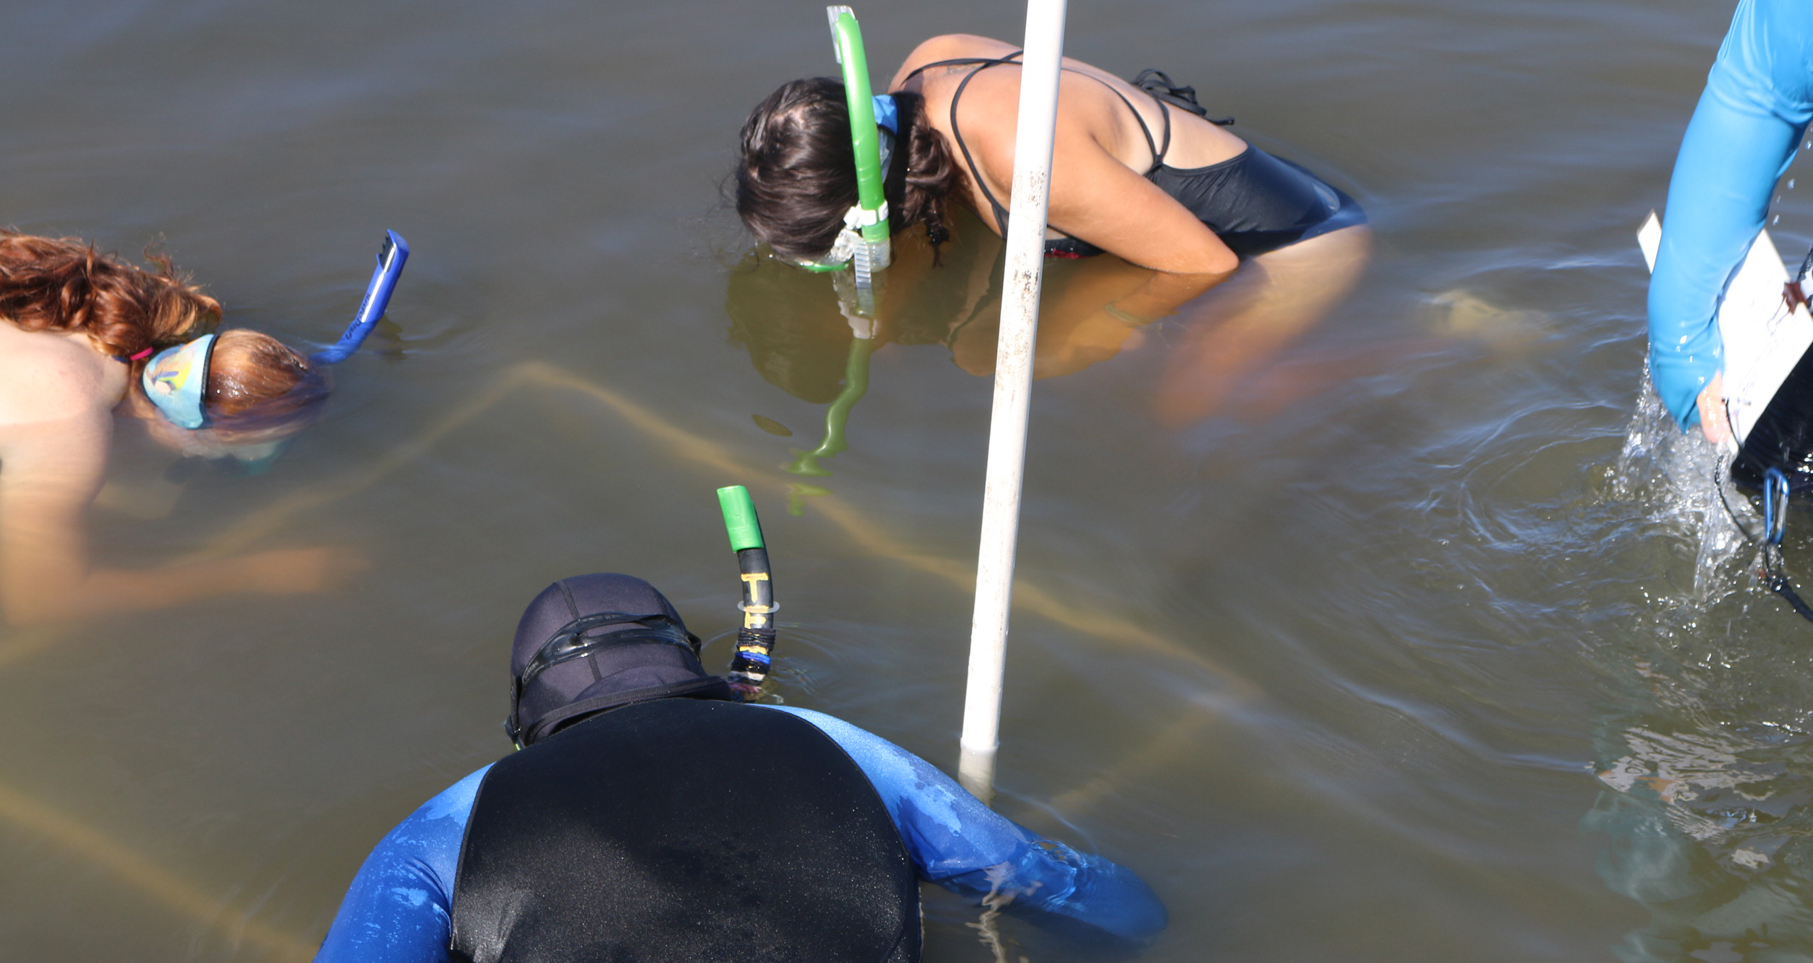 seagrass volunteers snorkeling in the water